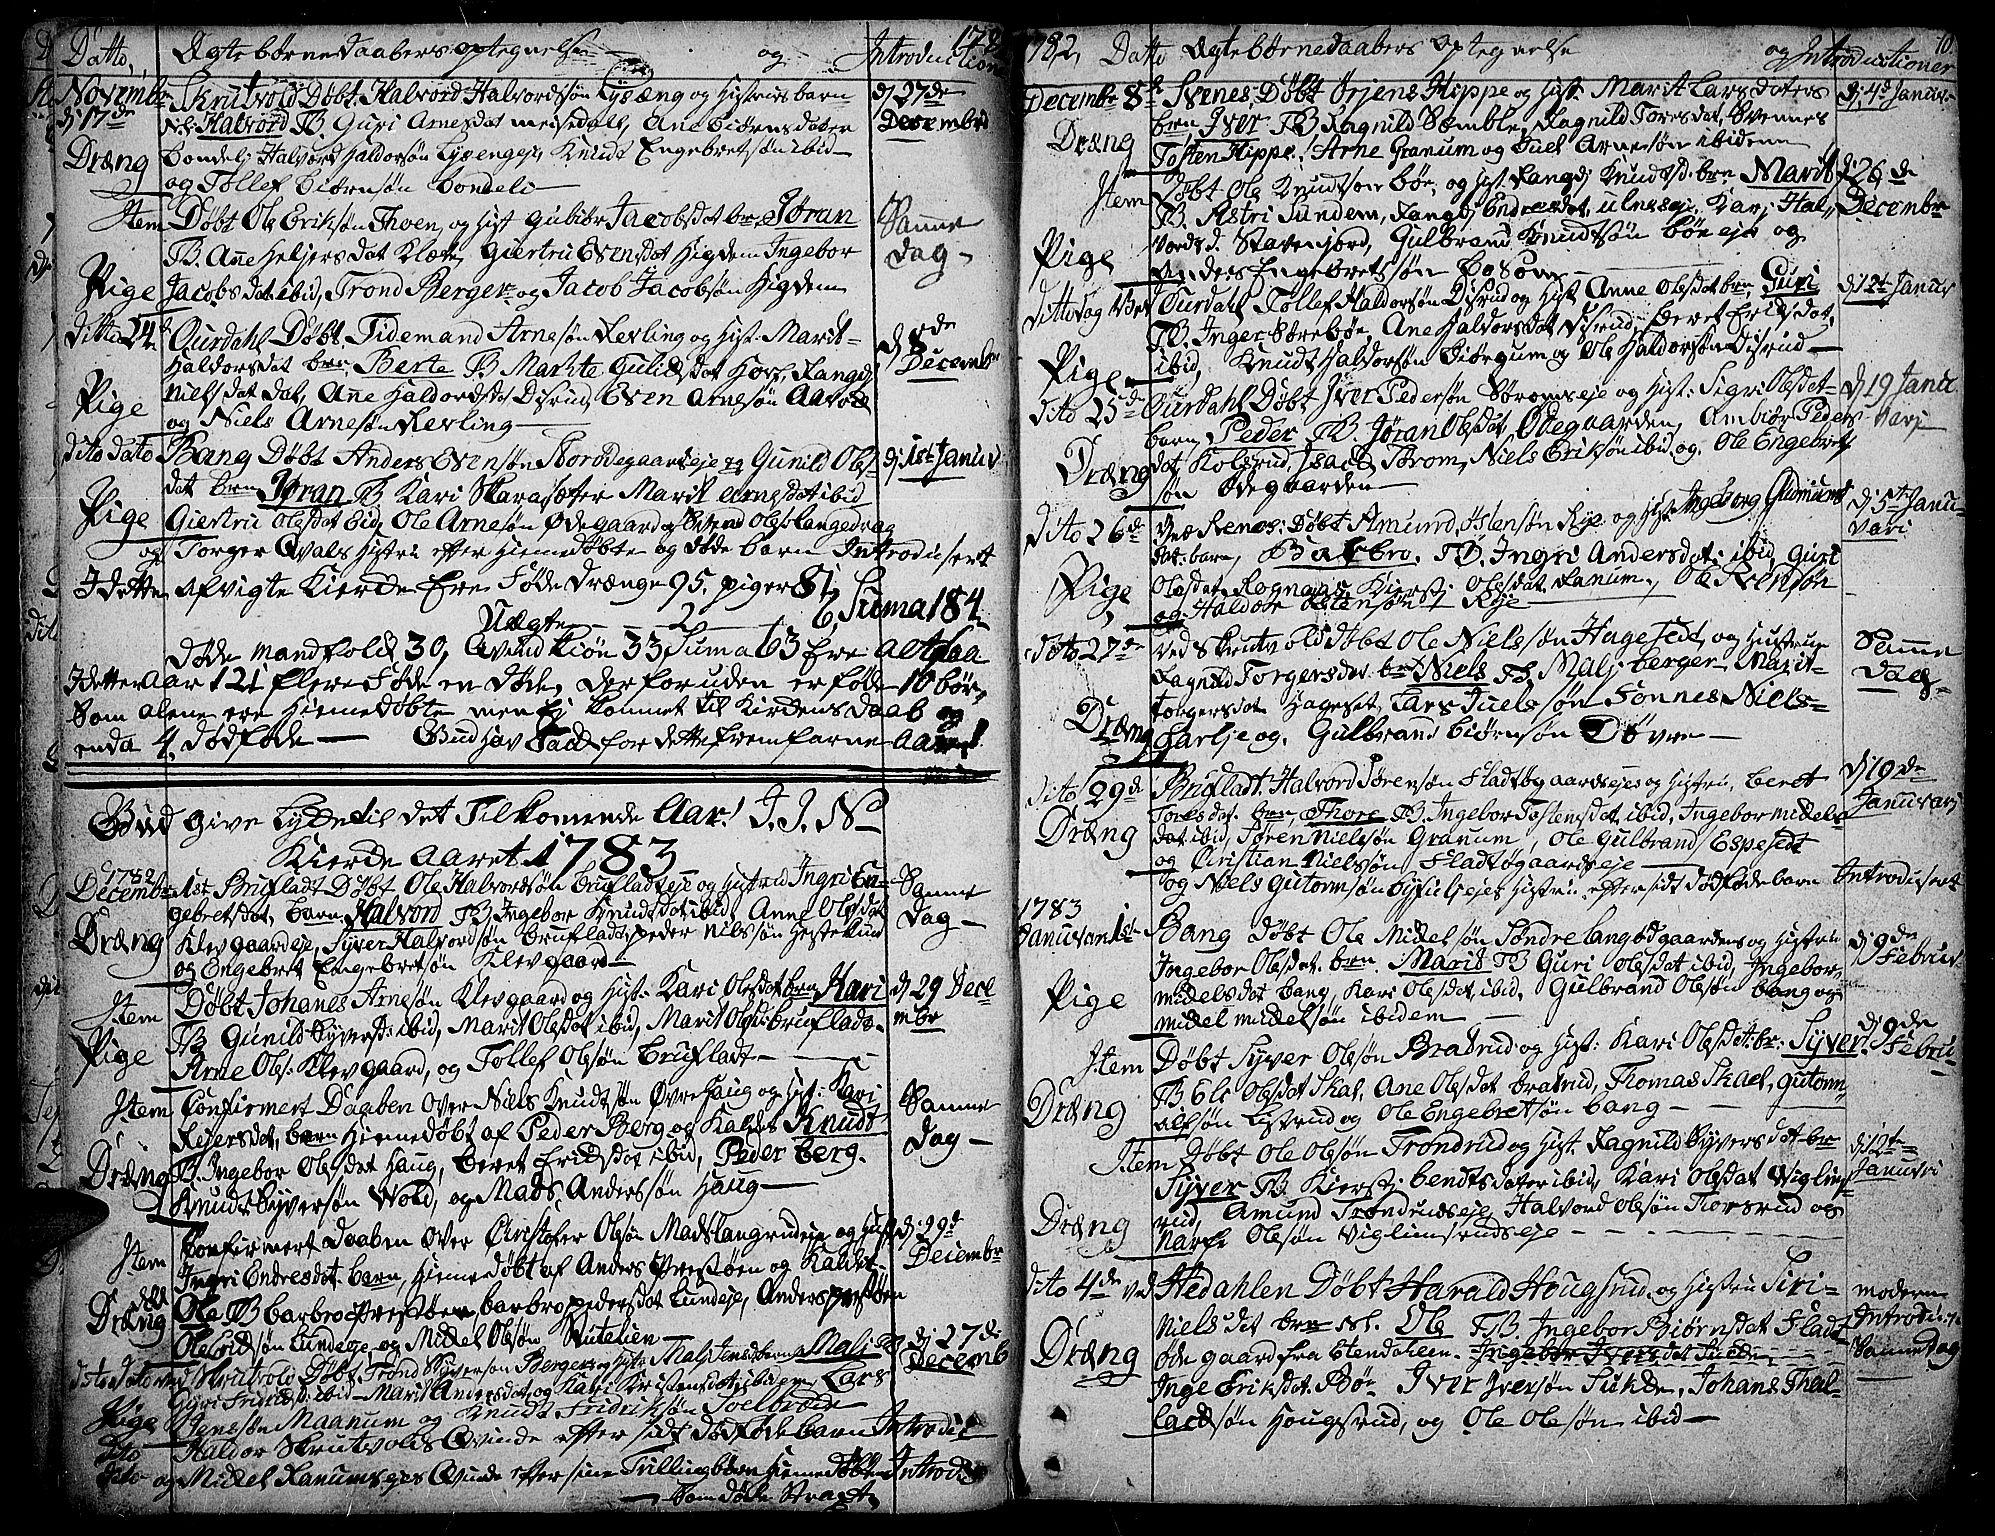 SAH, Aurdal prestekontor, Ministerialbok nr. 6, 1781-1804, s. 10